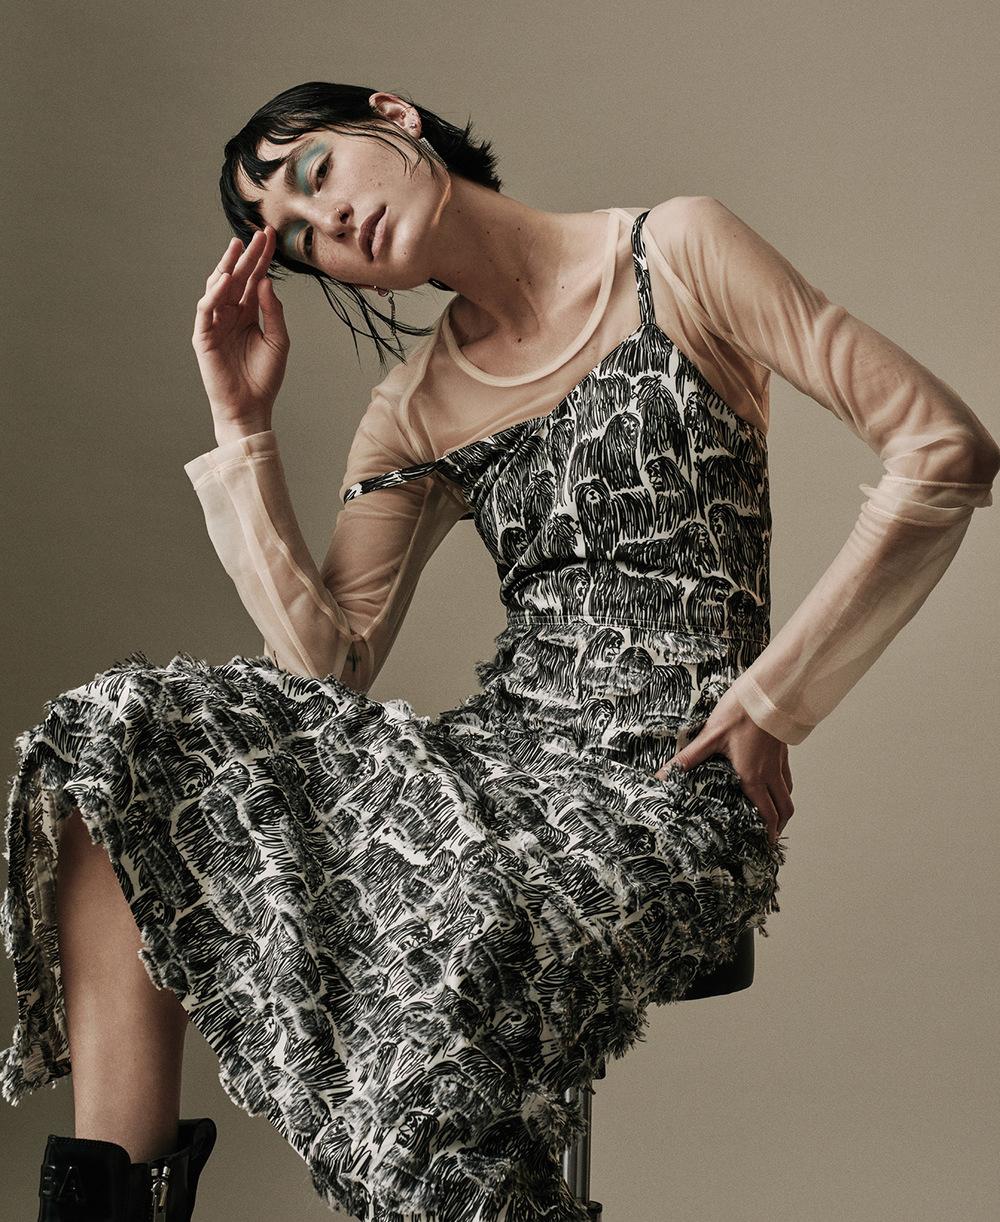 Heather Kemesky, Models.com